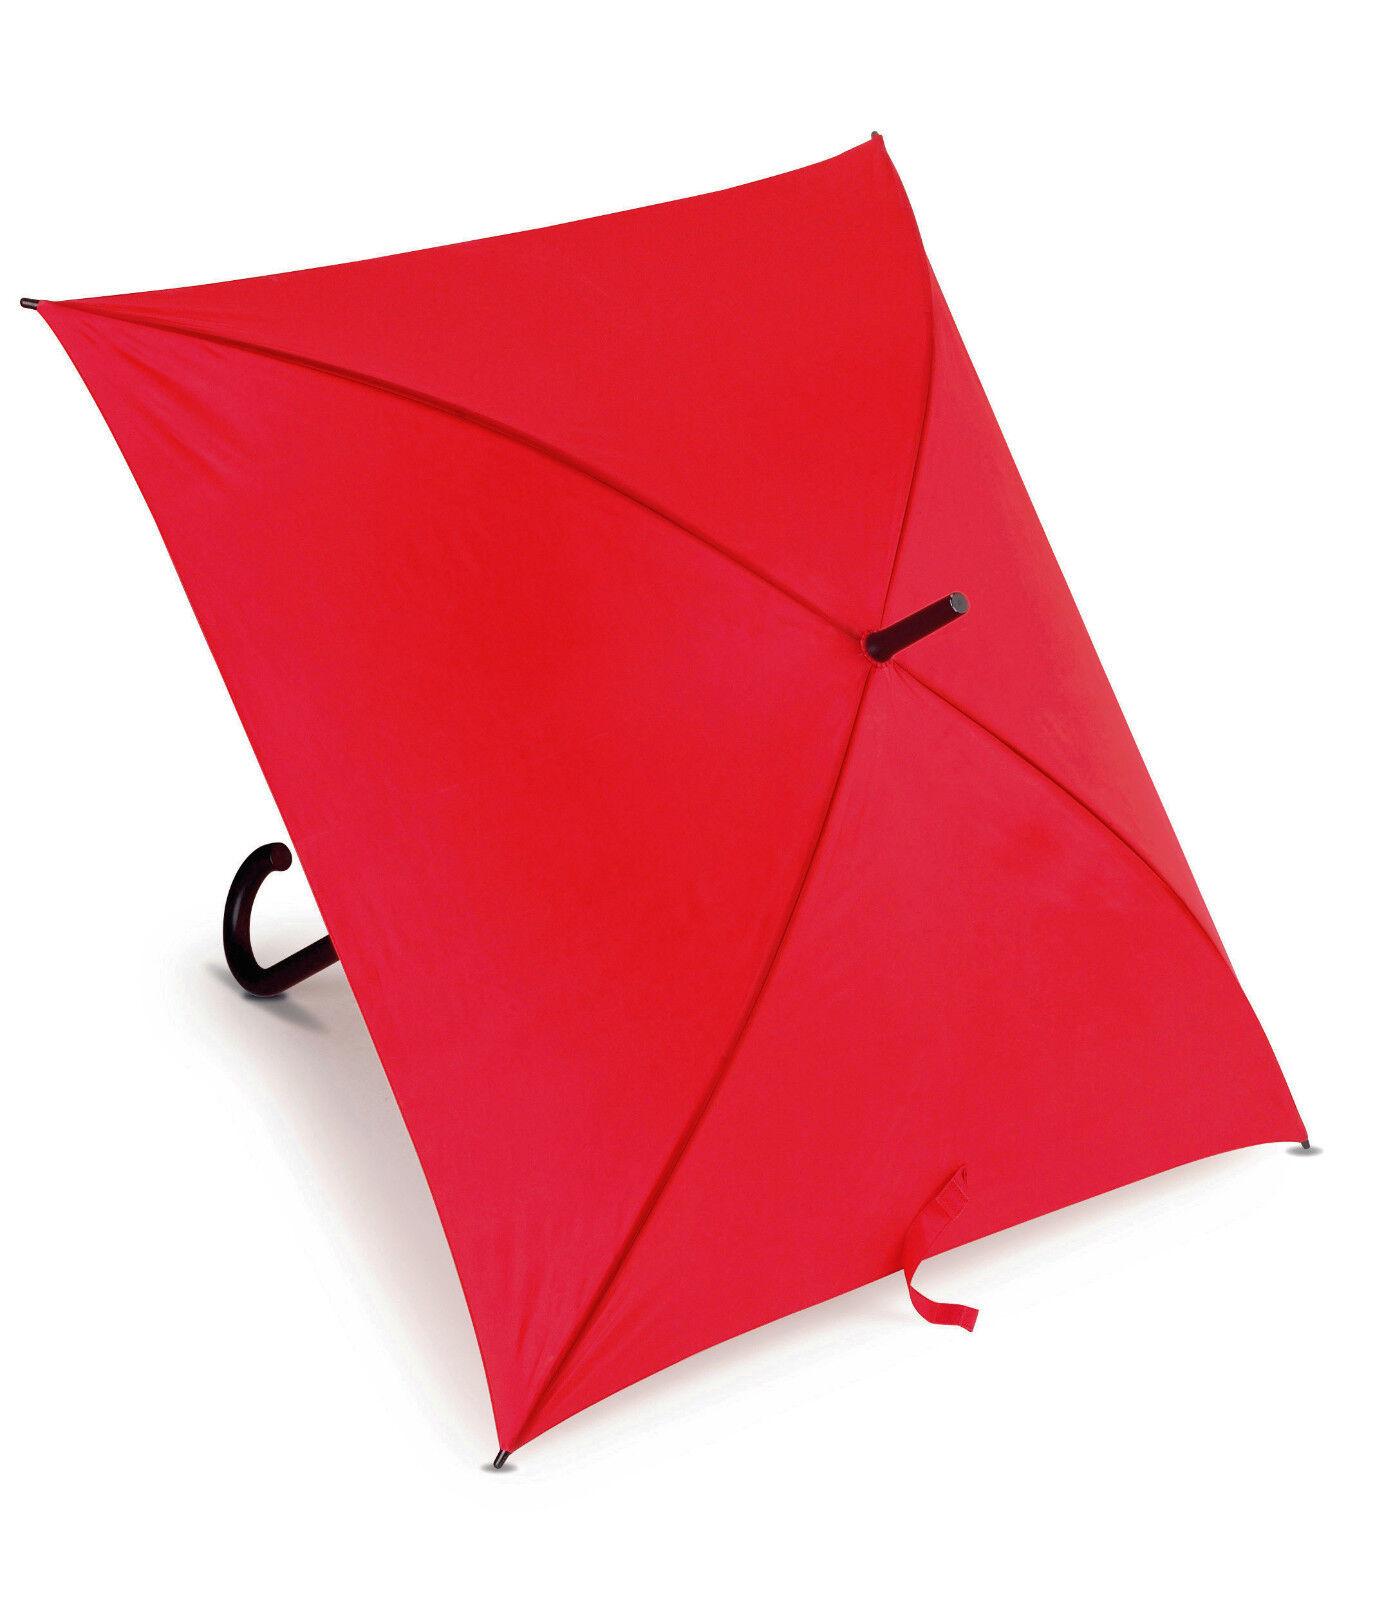 2 Square Wedding umbrellas. Plastic crooked handle & metal shaft & ribs. 111cmØ